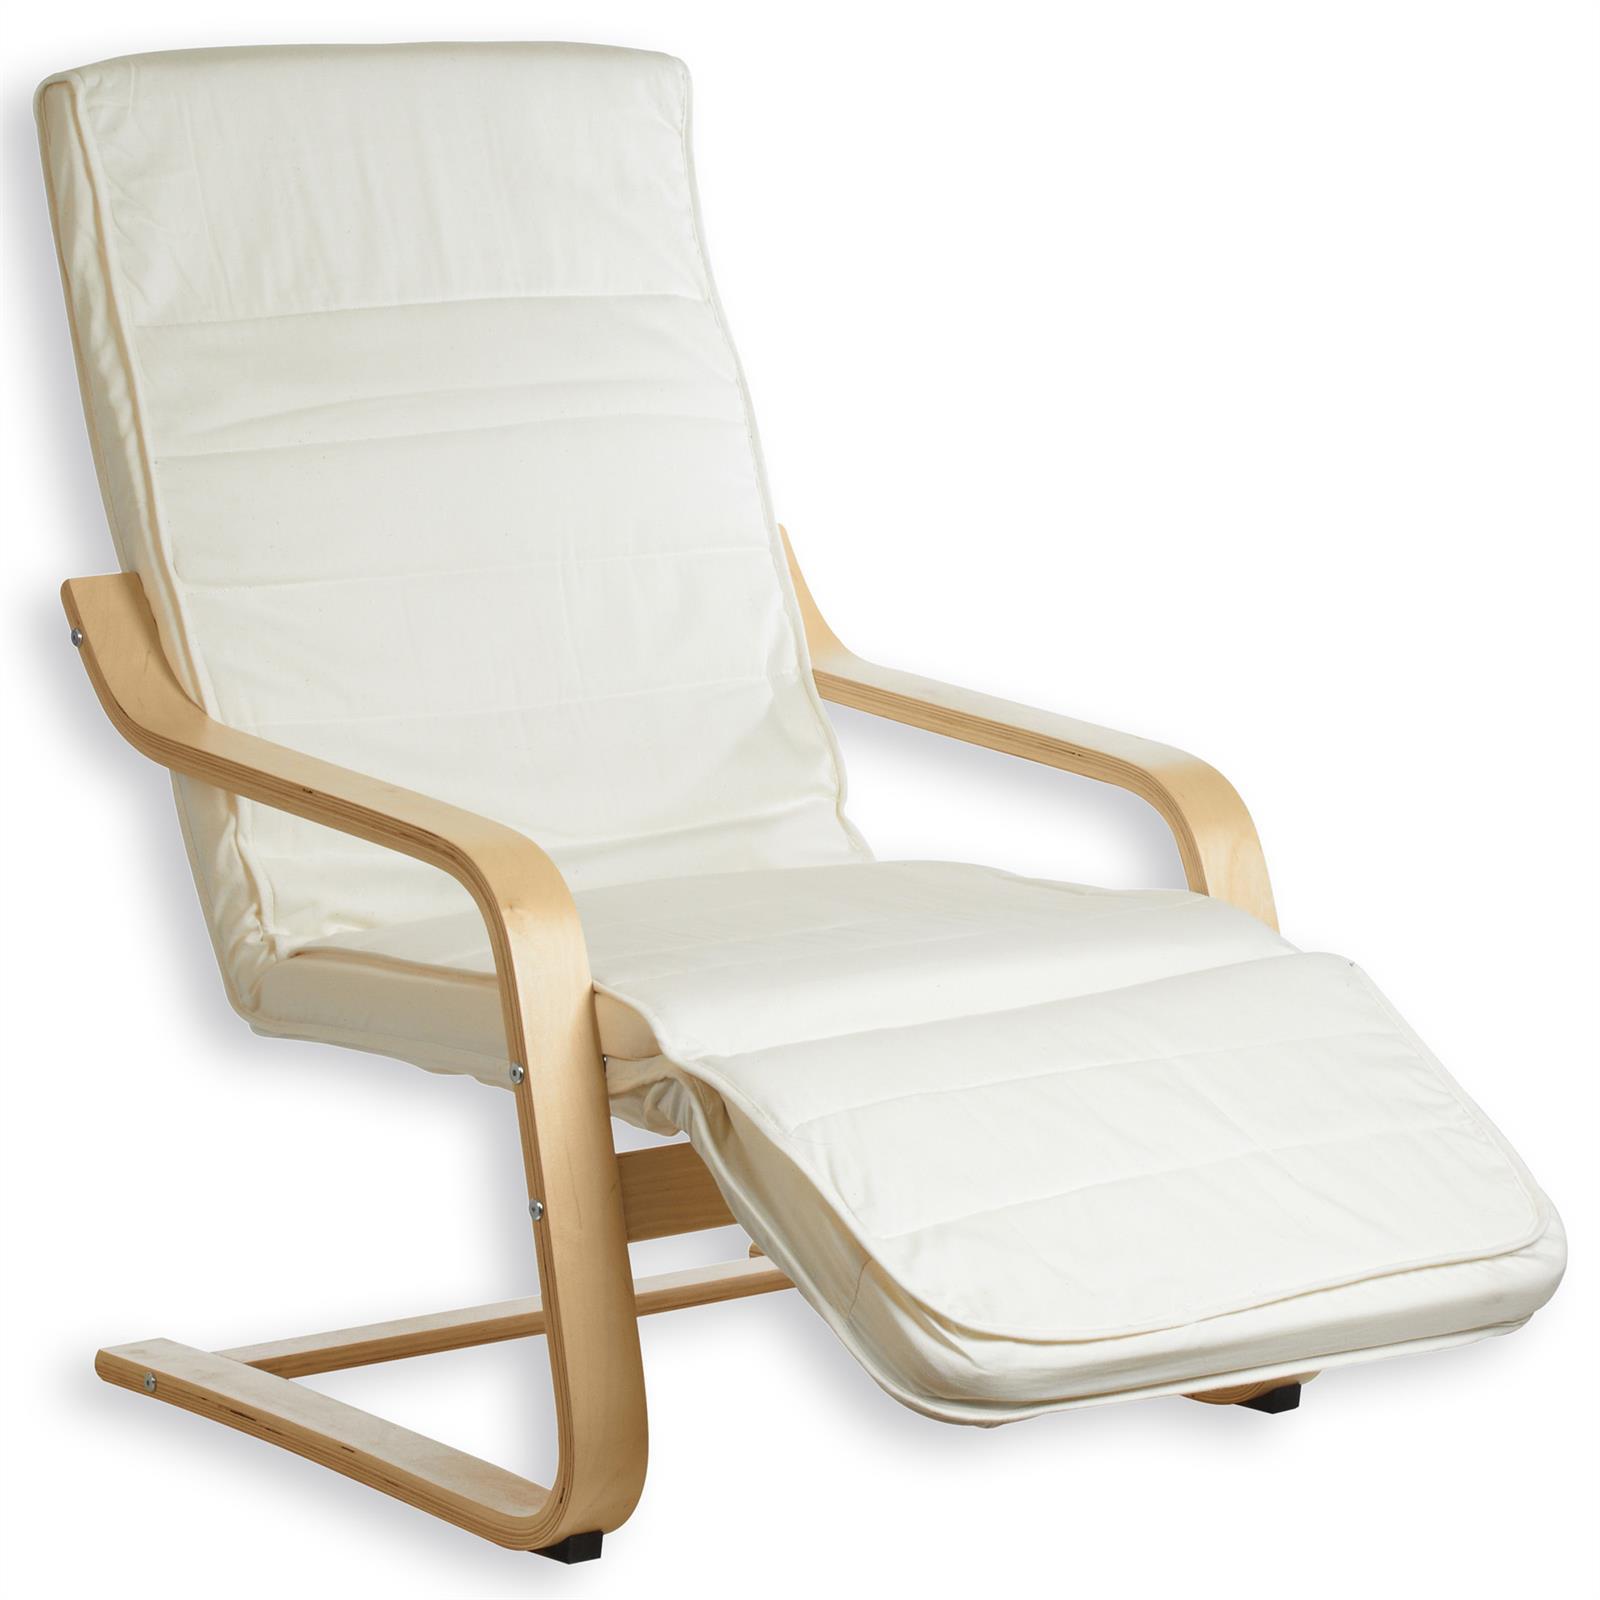 Fauteuil avec repose pieds int gr kessi beige mobil meubles - Fauteuil avec repose pieds ...